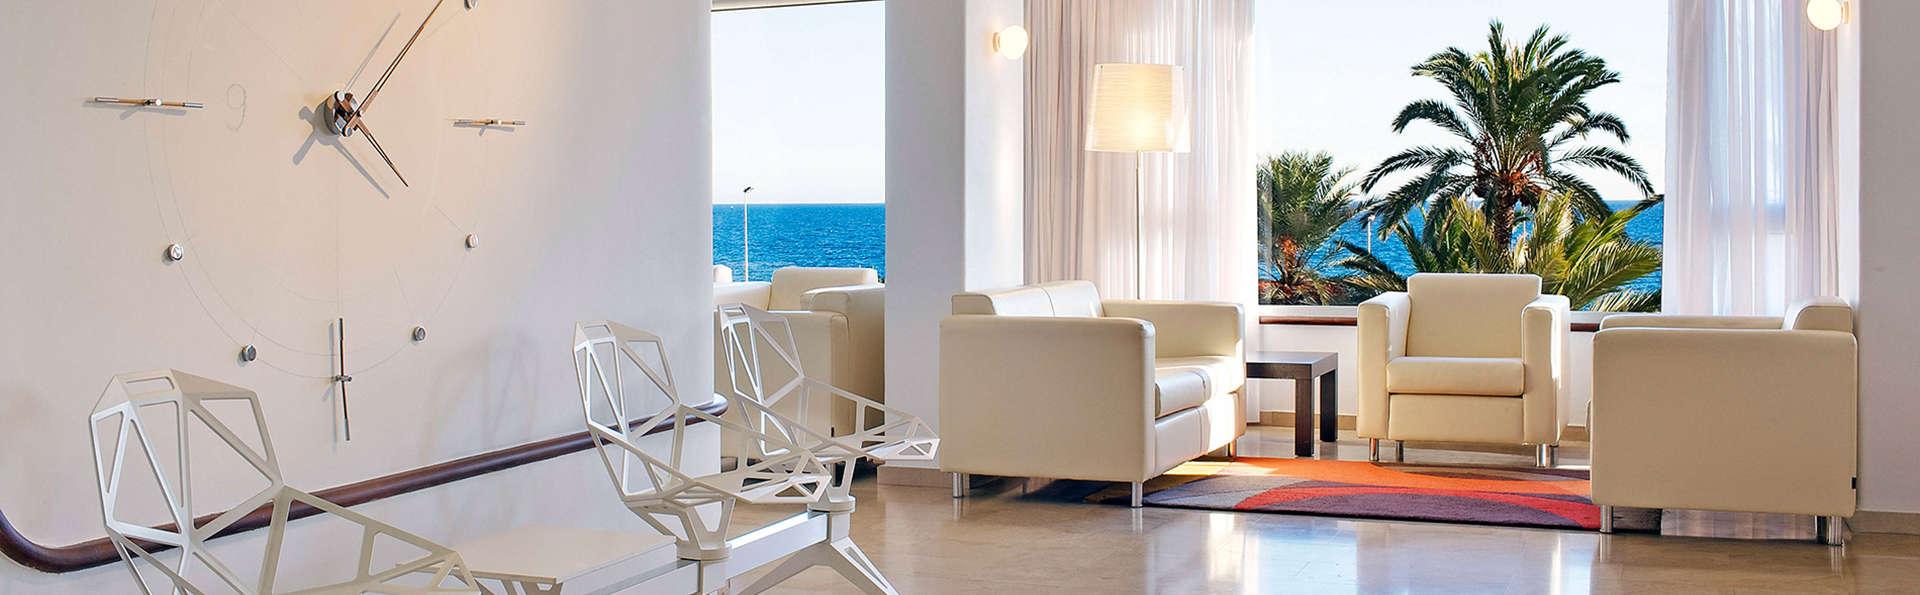 Hotel Albahia Alicante - EDIT_lounge.jpg